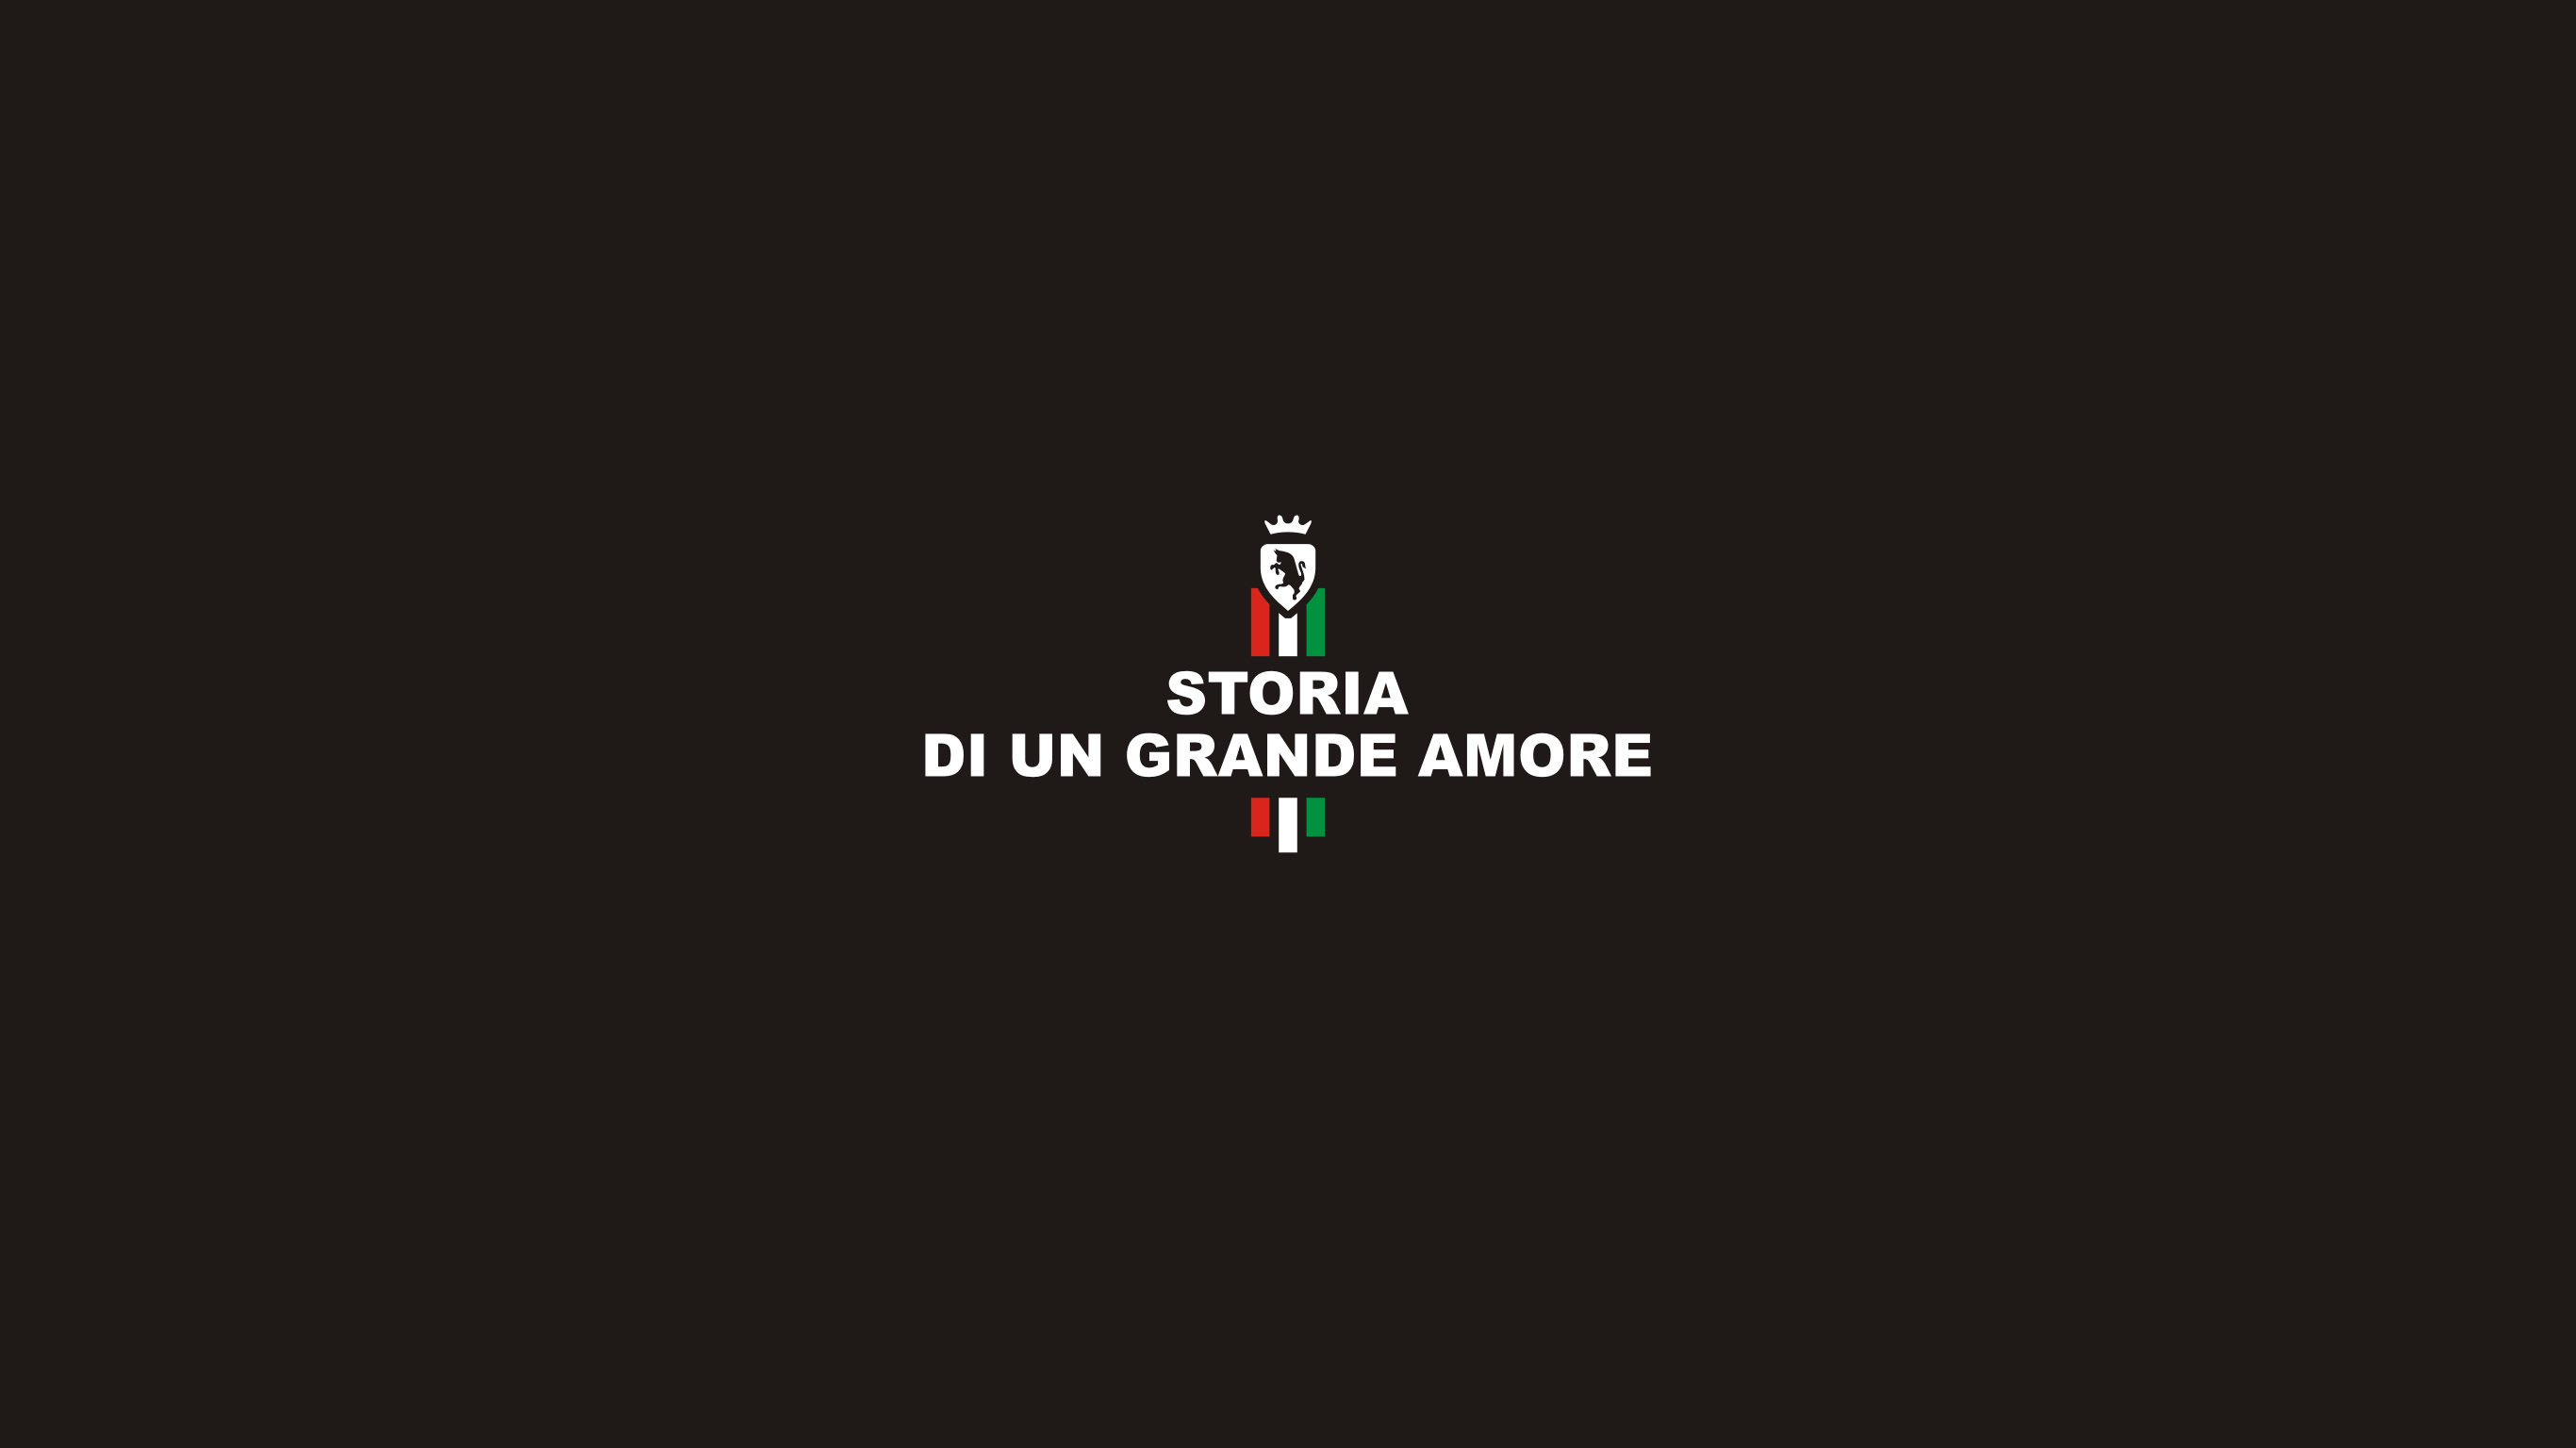 Most Inspiring Wallpaper Logo Juventus - c628928d4a7c884e76a1b44ed3d3bf35  Collection_109259.png